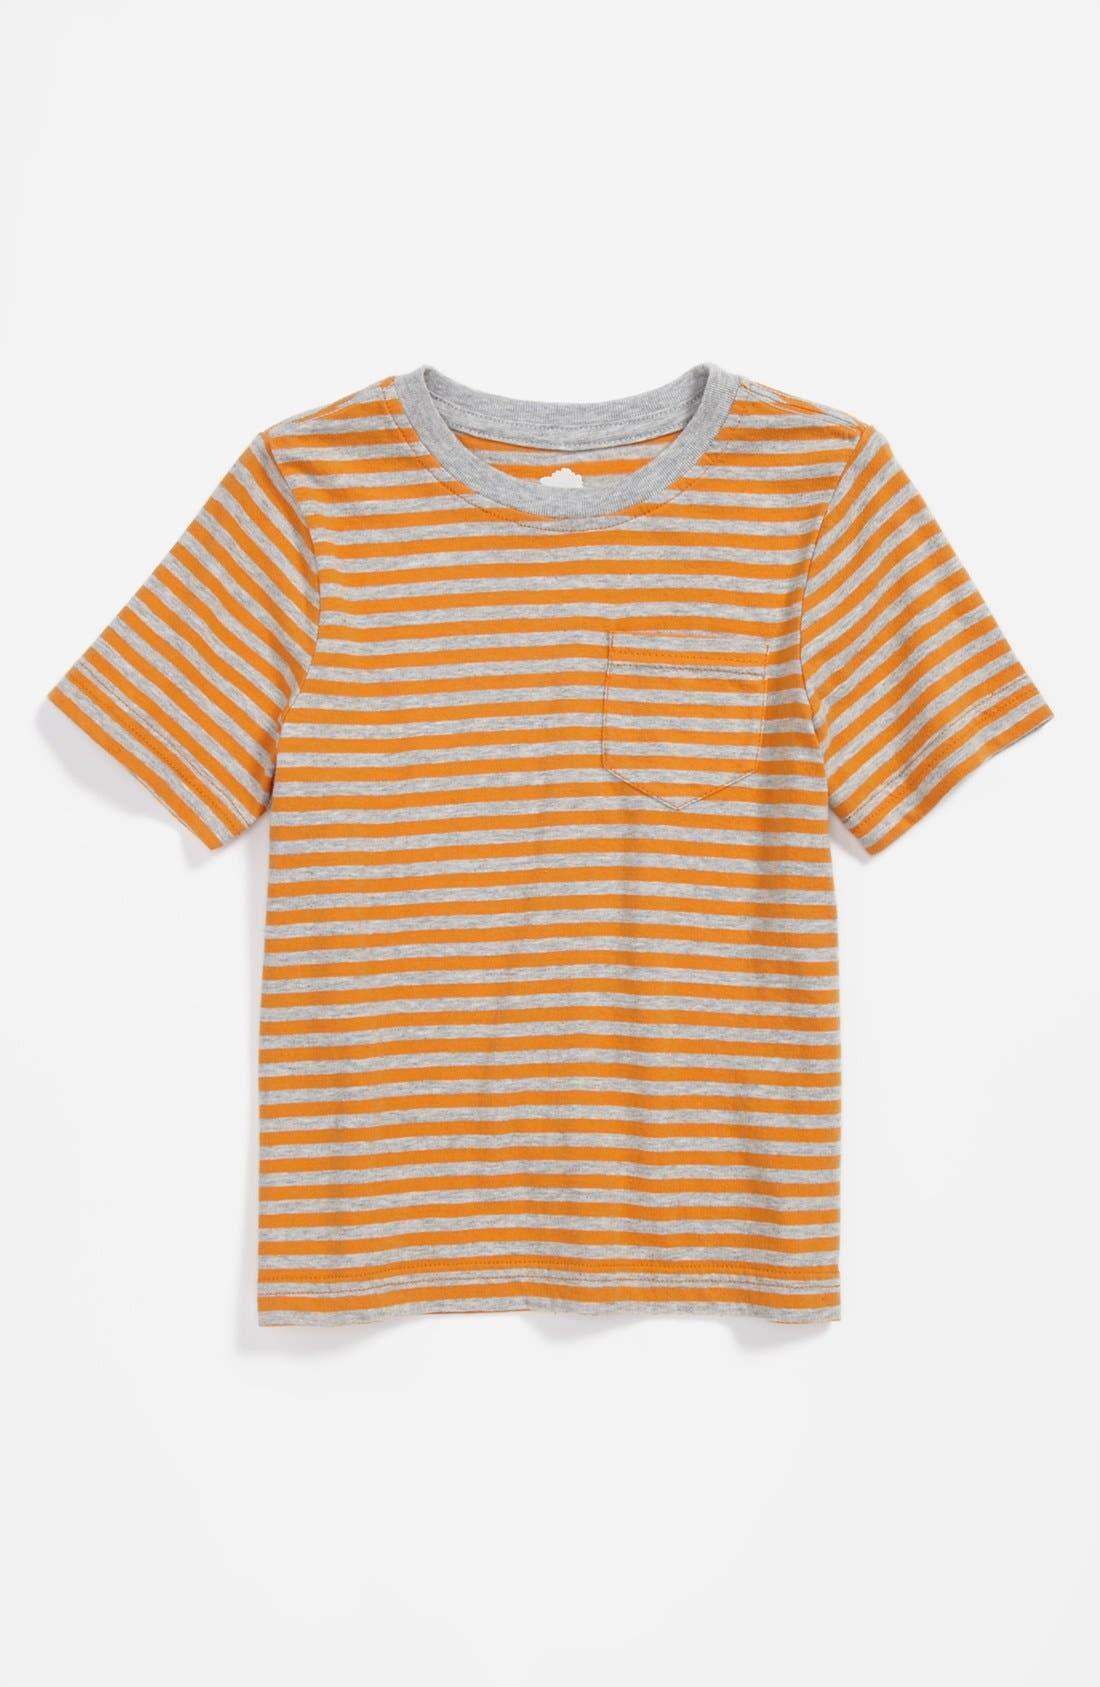 Alternate Image 1 Selected - Tucker + Tate 'Westlake Stripe' Pocket T-Shirt (Little Boys)